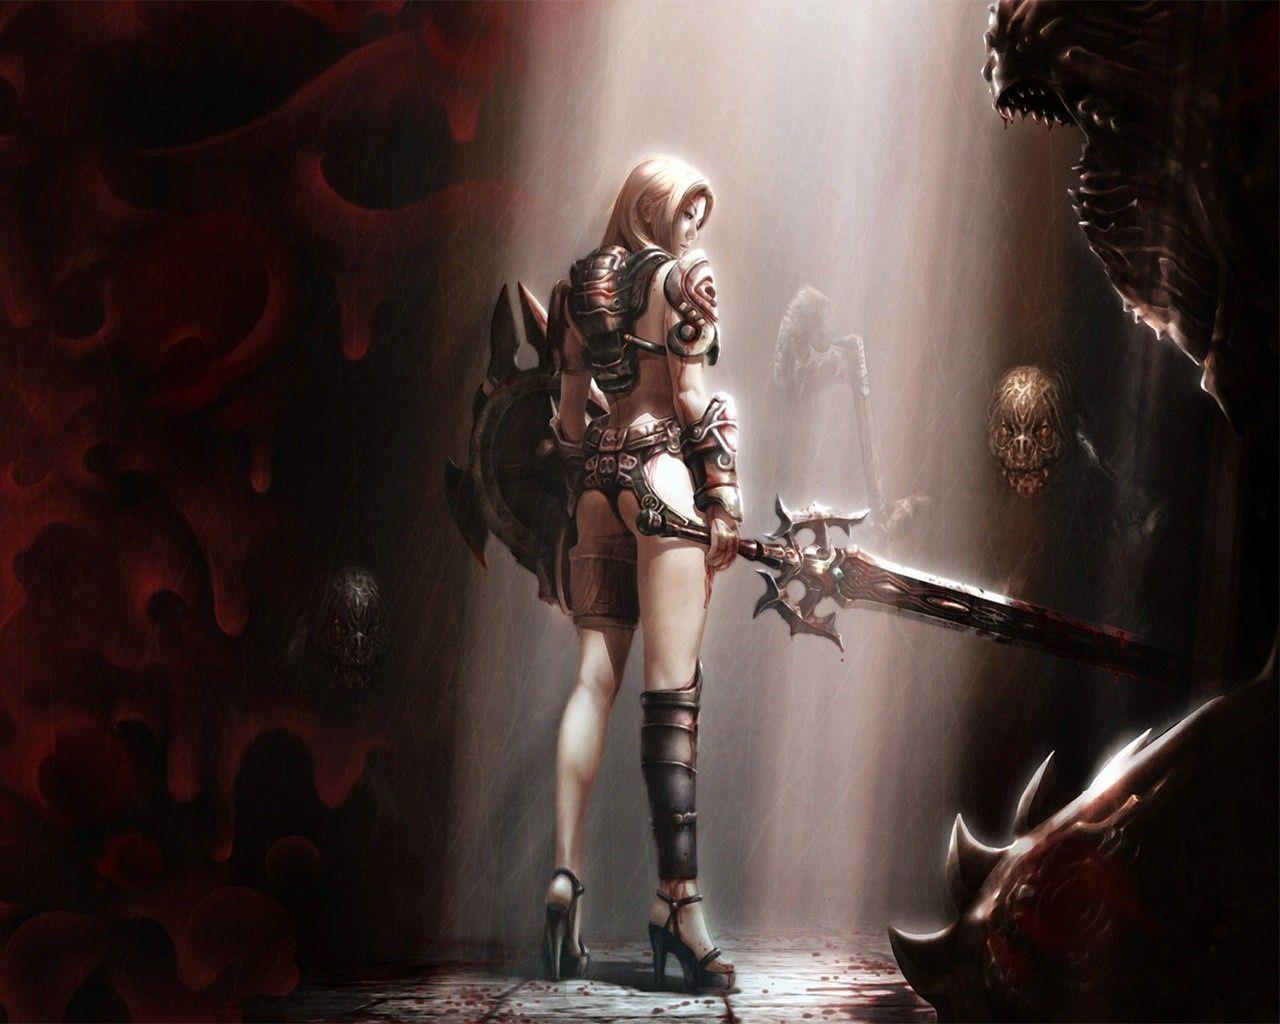 Fantasy Warrior Girl Warrior Girl Fantasy Warrior Warrior Woman